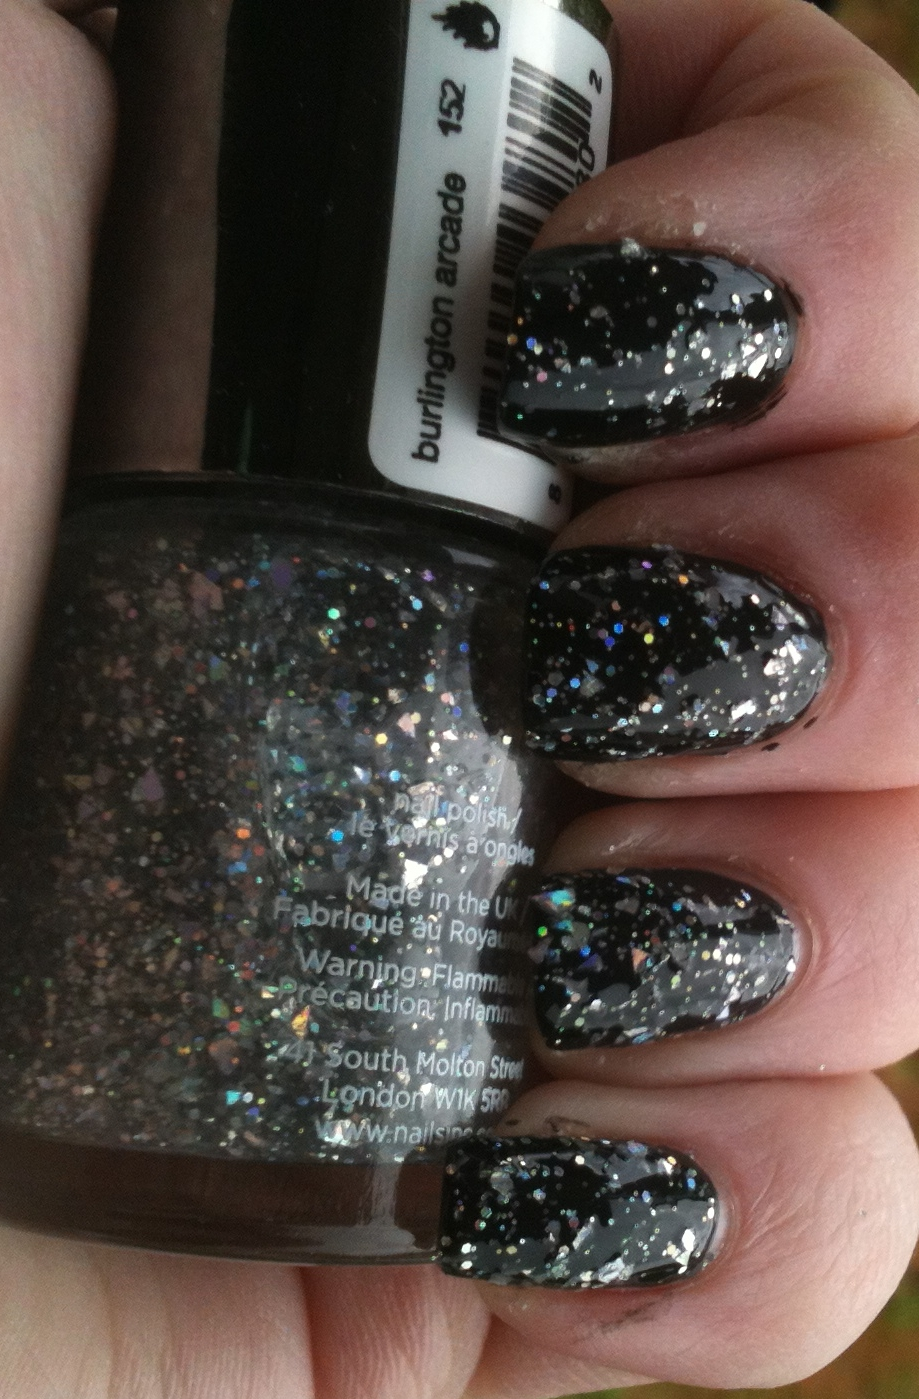 Give Me Polish: Nails Inc Burlington Arcade